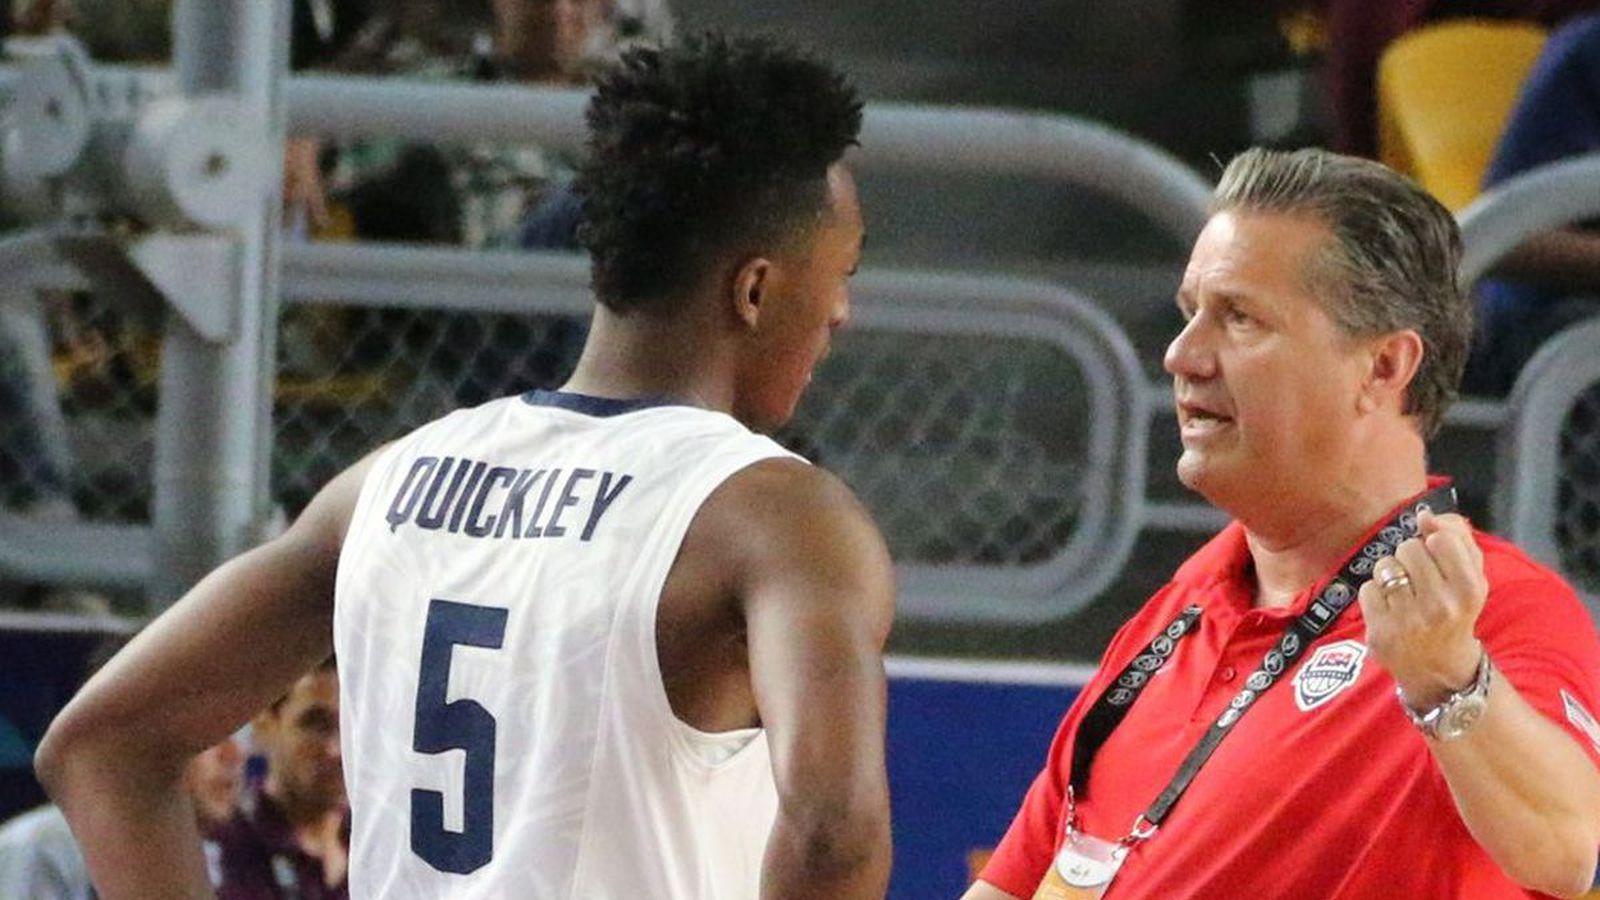 2013 Recruits Uk Basketball And Football Recruiting News: Kentucky Wildcats Basketball Recruiting: 2018 Class Big